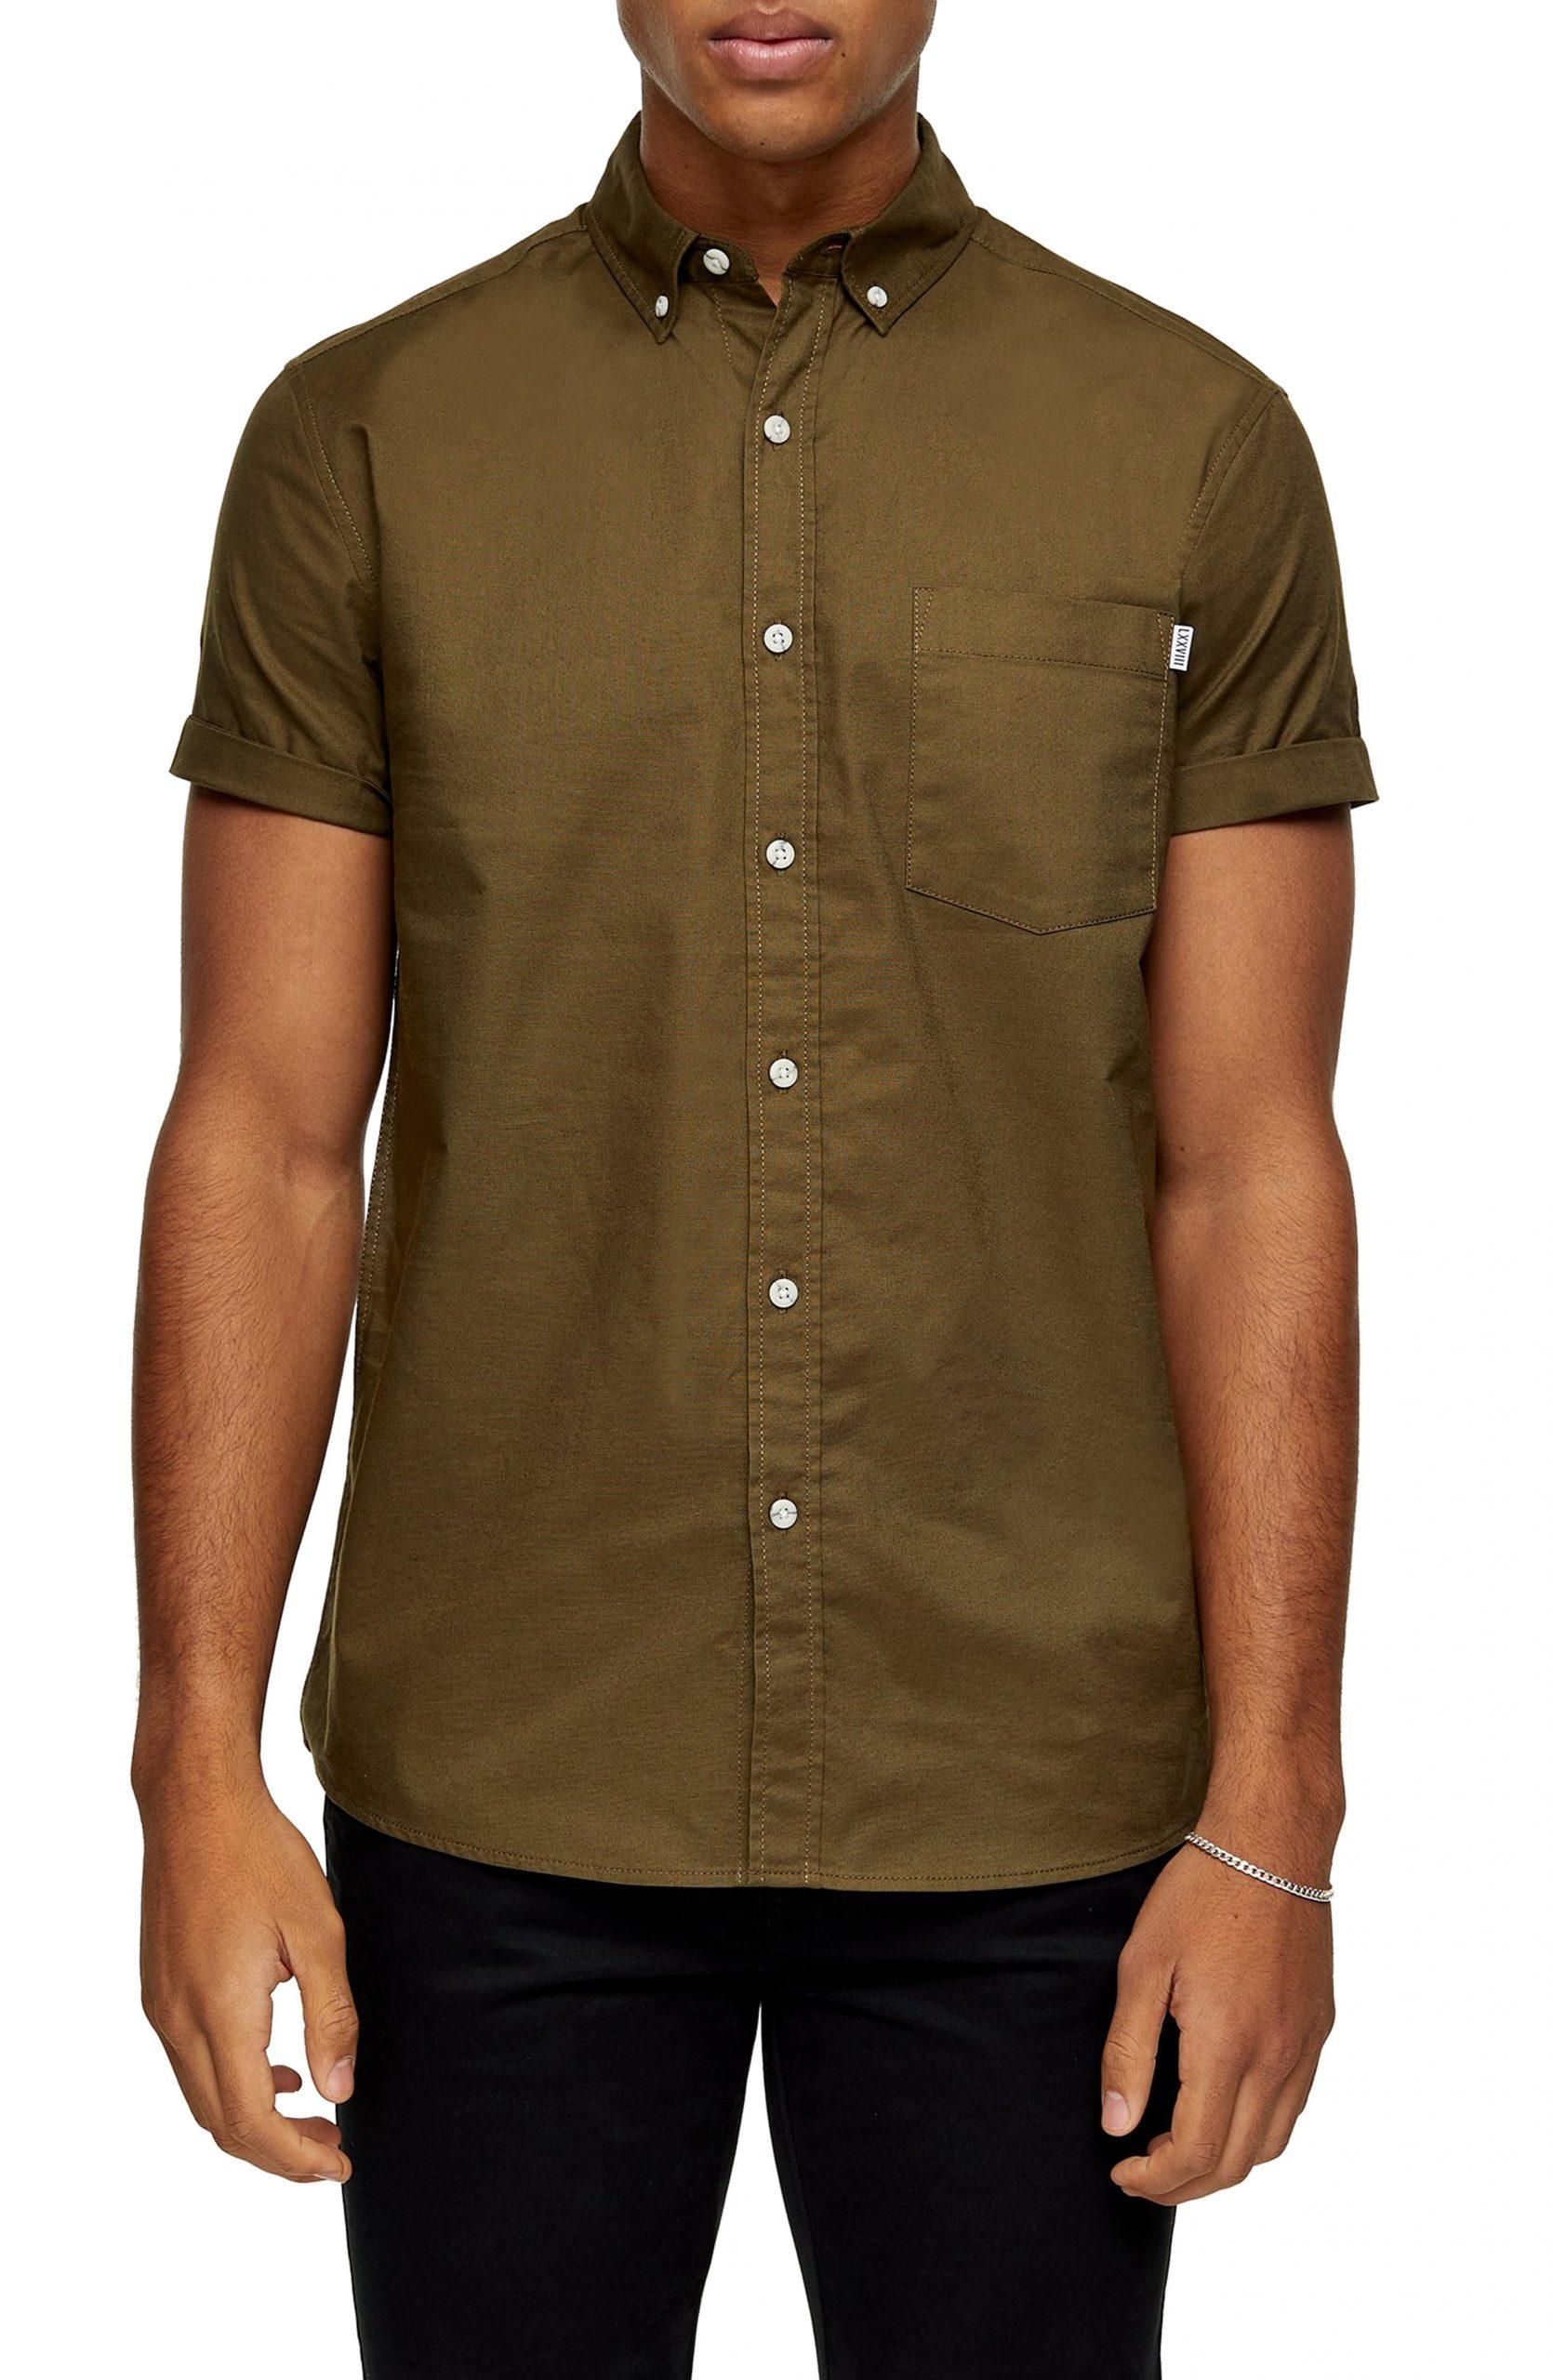 Topman Men/'s Shirt Size Small brand new